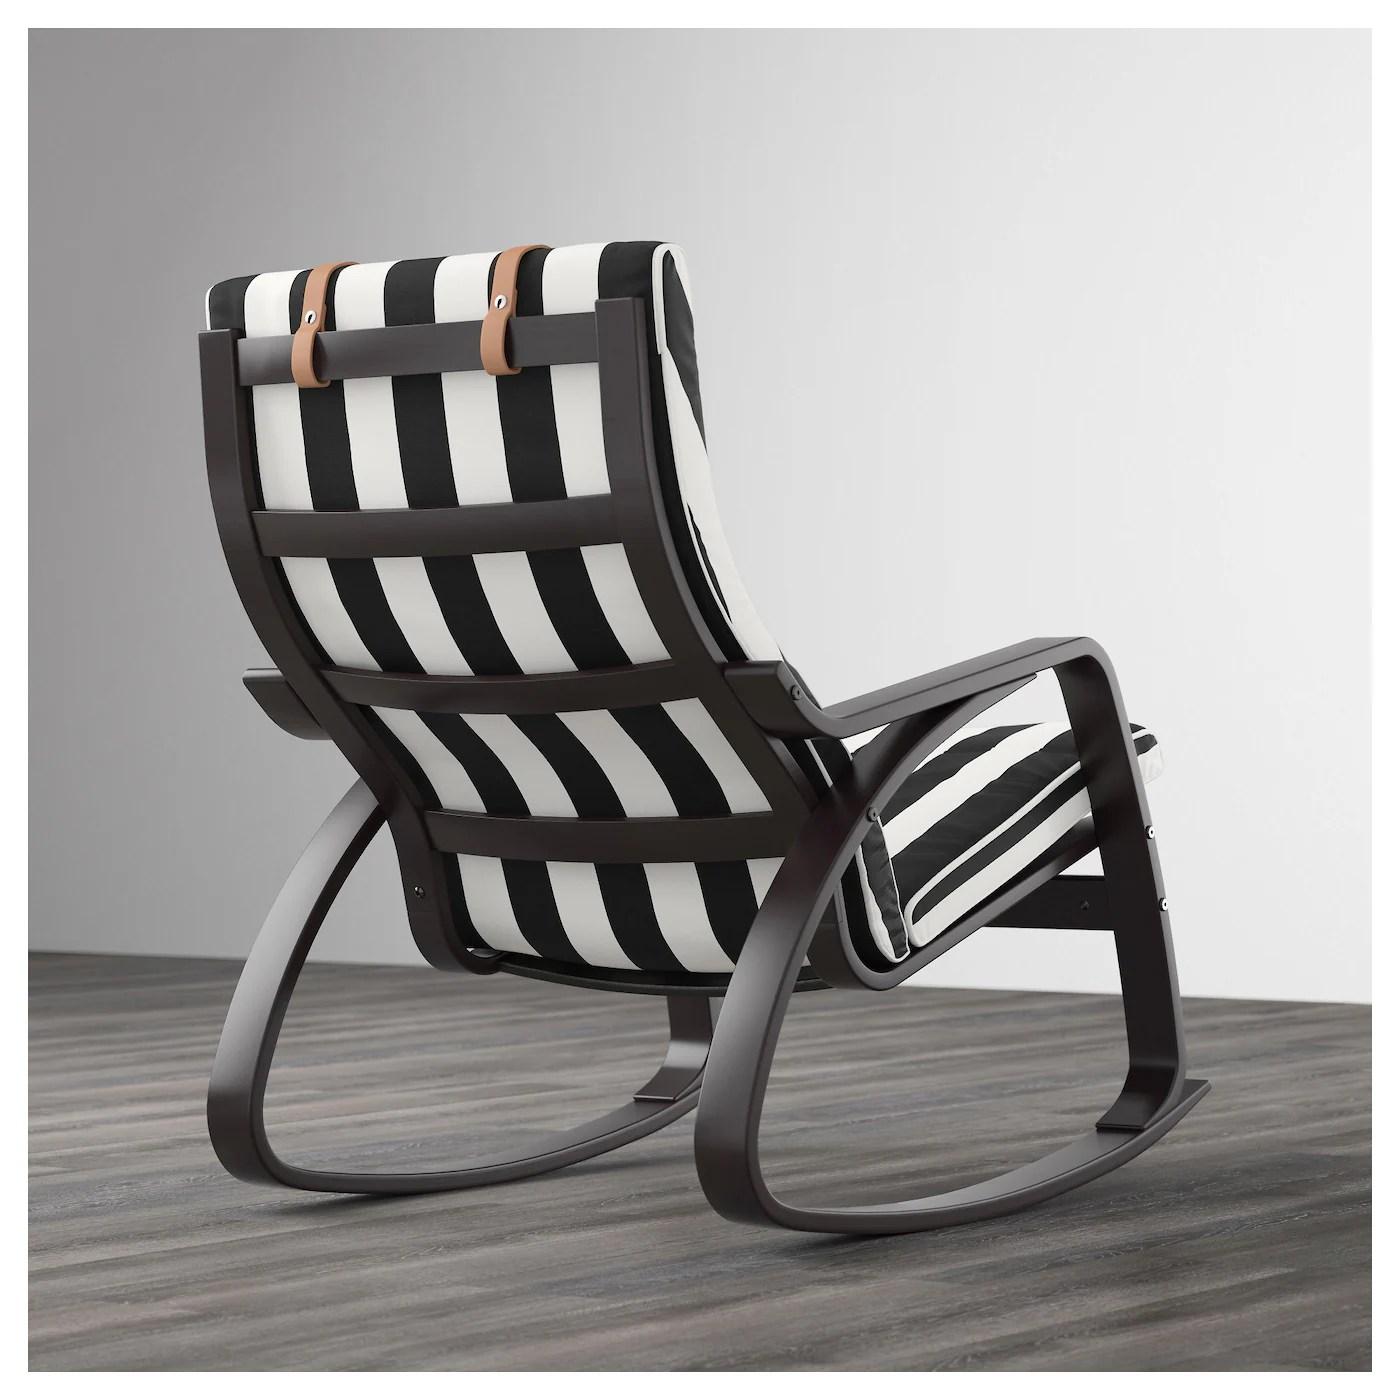 ikea white rocking chair indoor rattan cushions poÄng black brown stenli